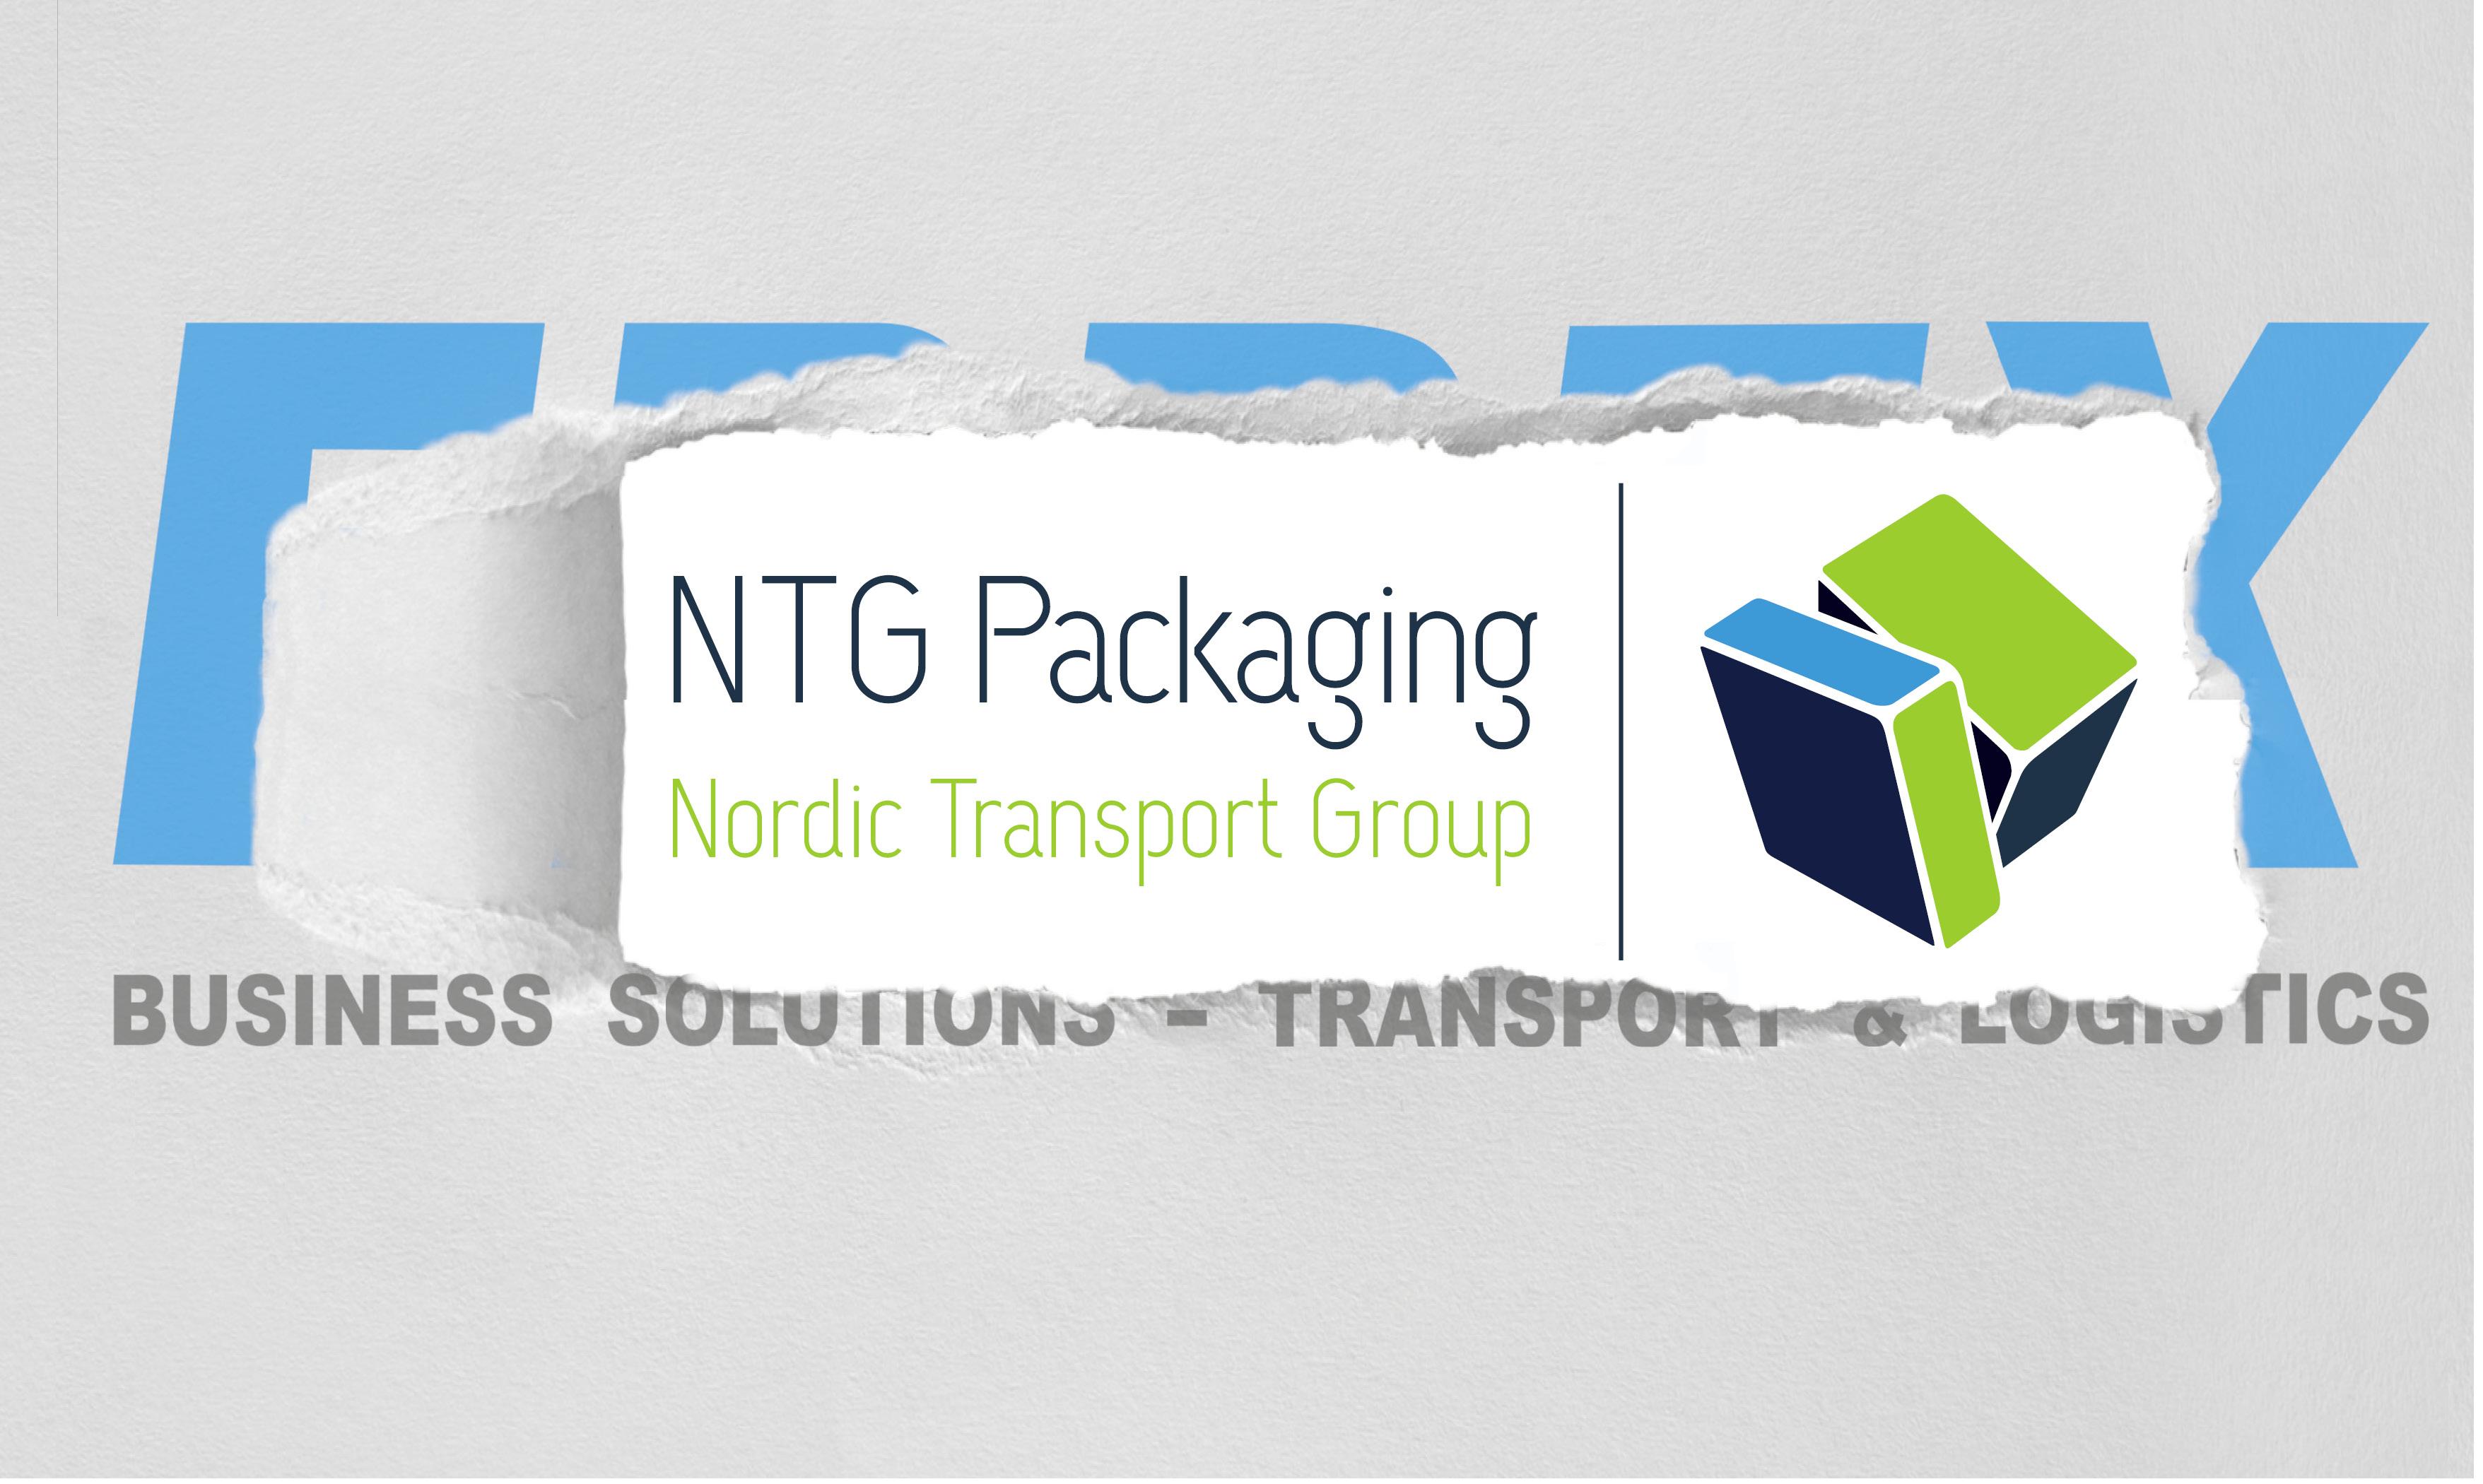 Umfirmierung zur NTG Packaging Solutions GmbH